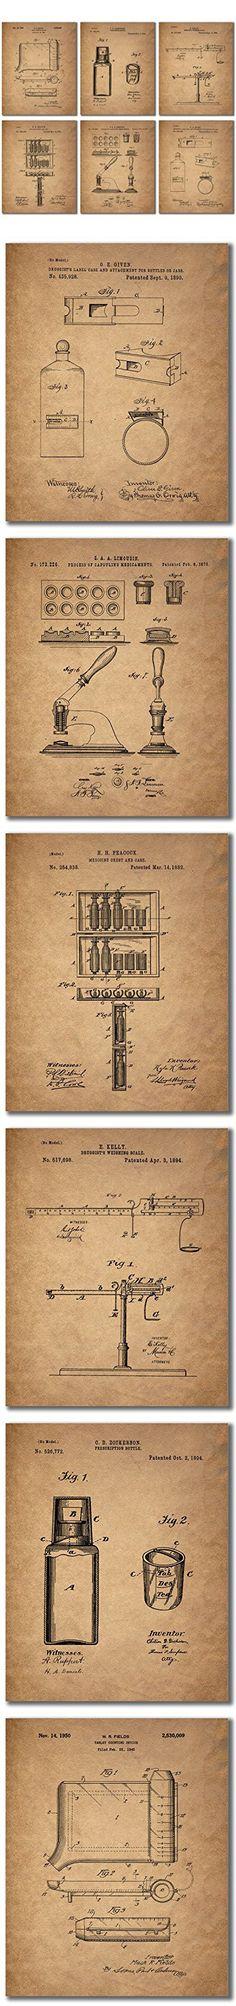 Pharmacist Patent Wall Art Prints - Set of Six Vintage Photos